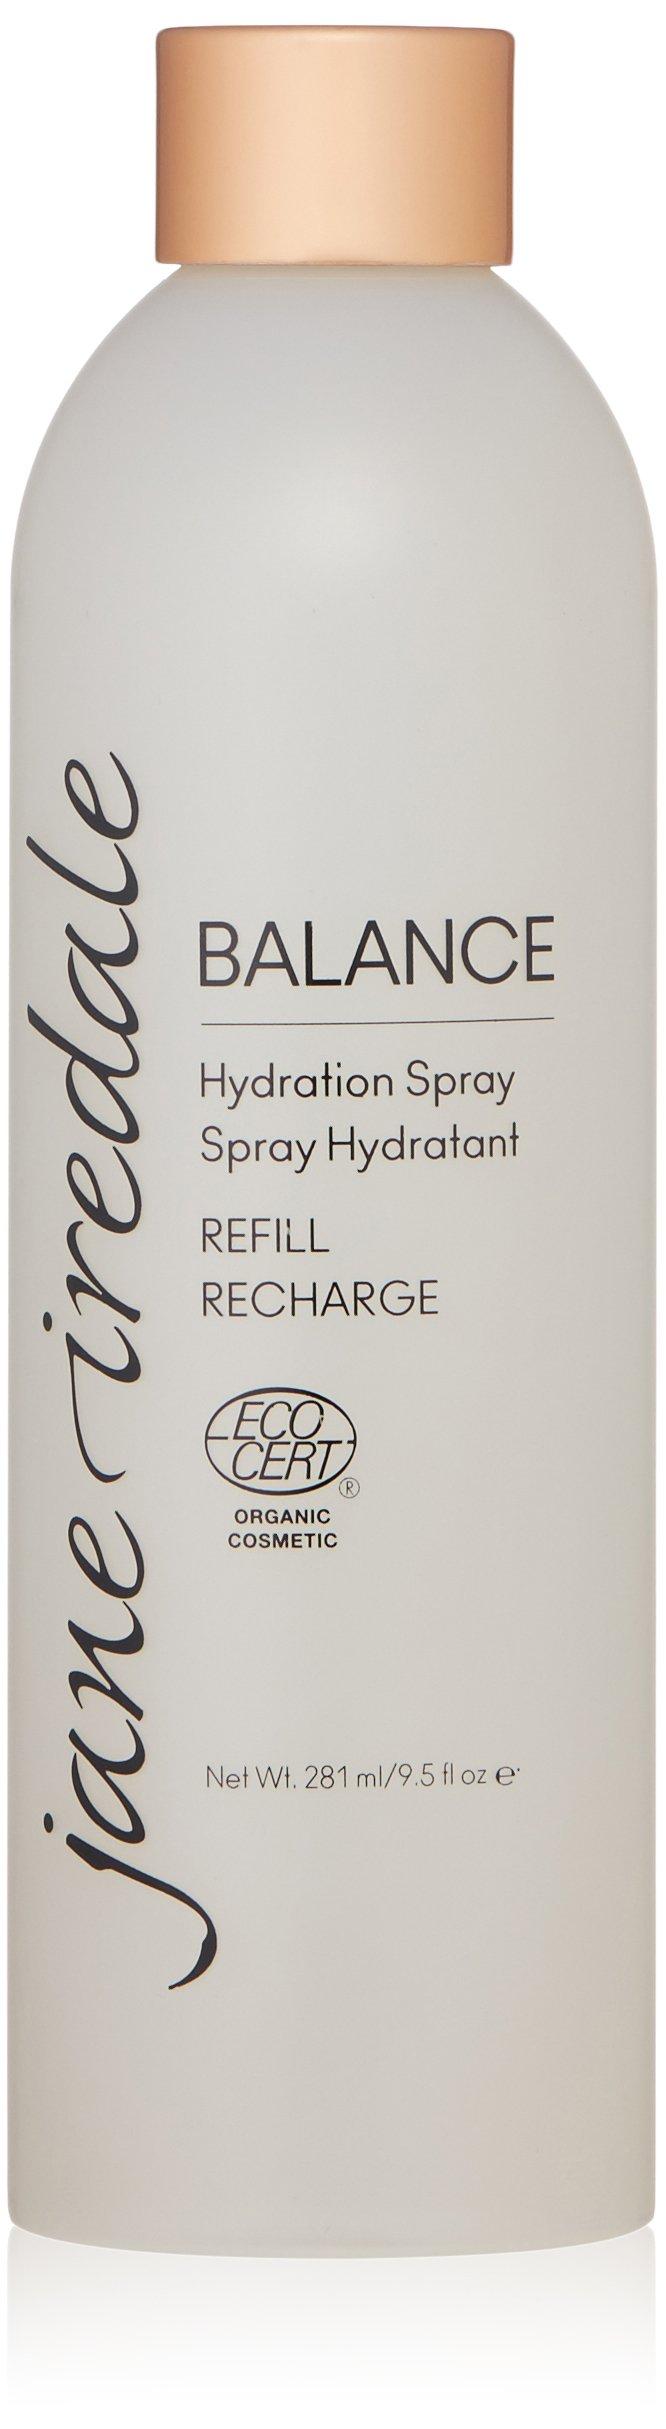 jane iredale Balance Hydration Spray Refill, 9.50 oz.